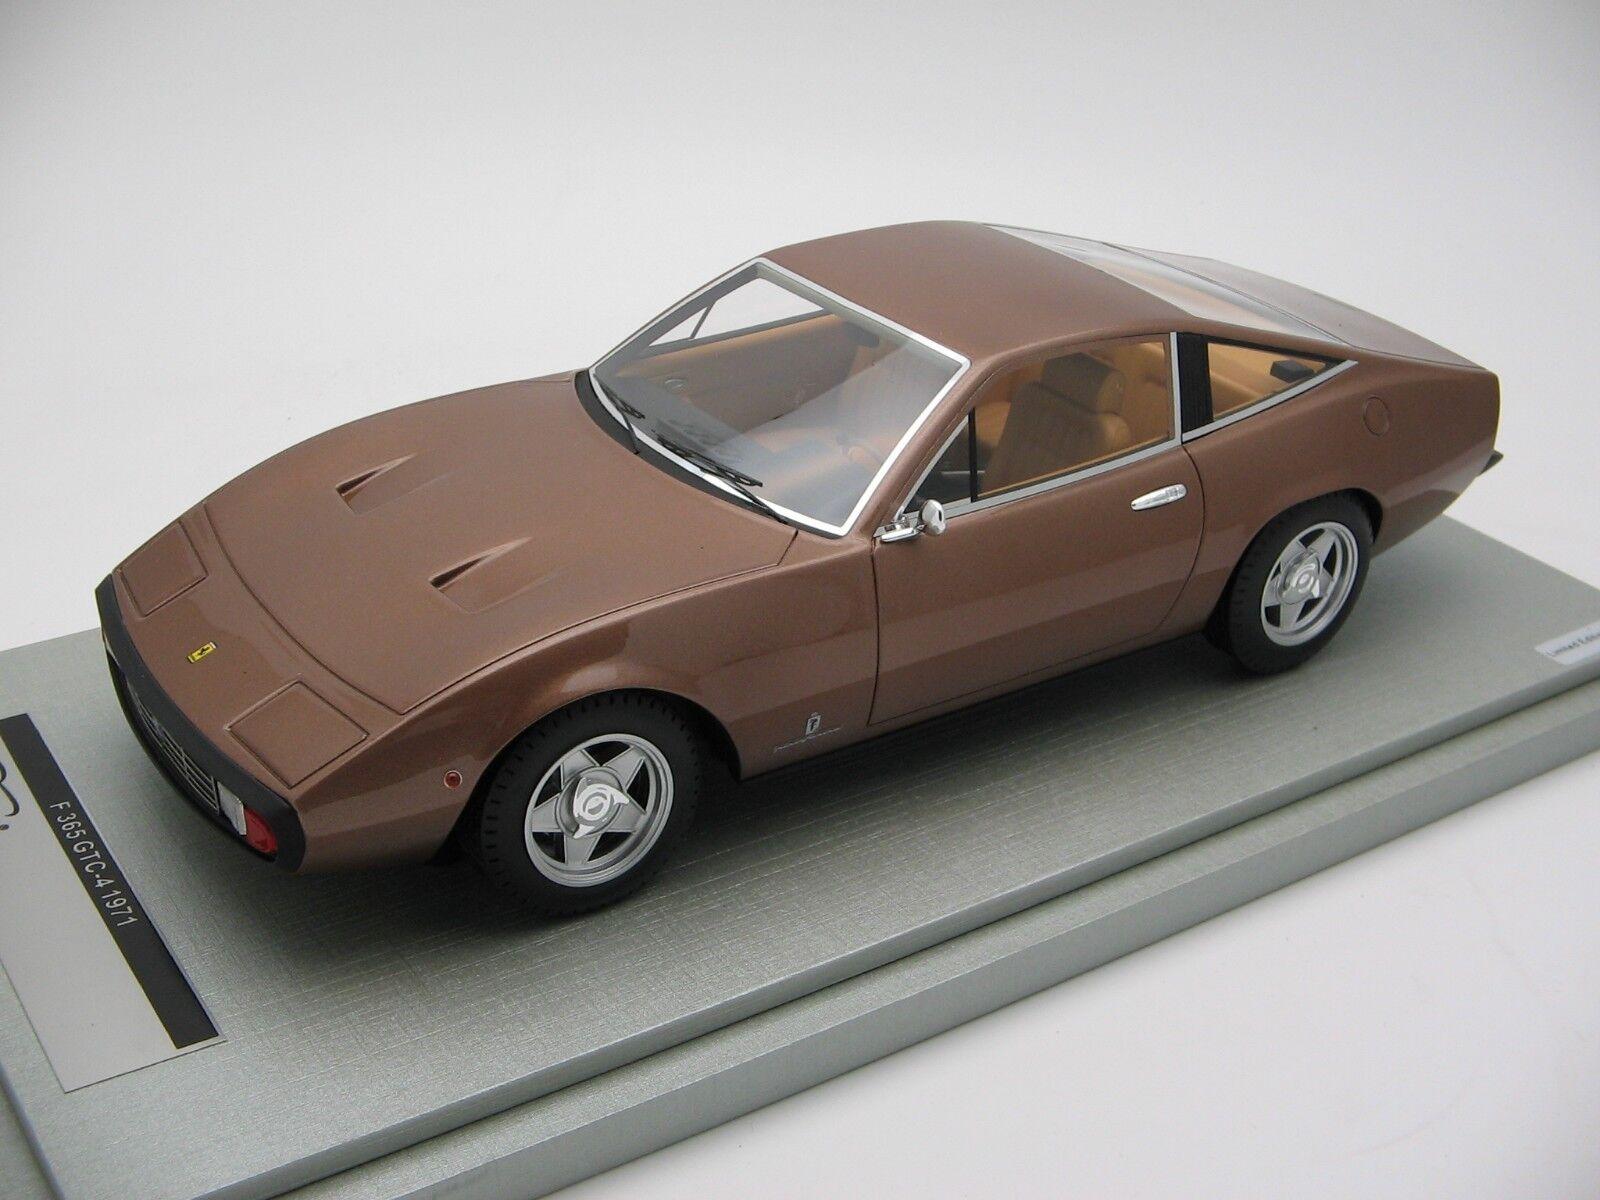 1 18 scale Tecnomodellolo Ferrari 365 GTC-4 Mettuttiic Bronze 1971 - TM18-92D